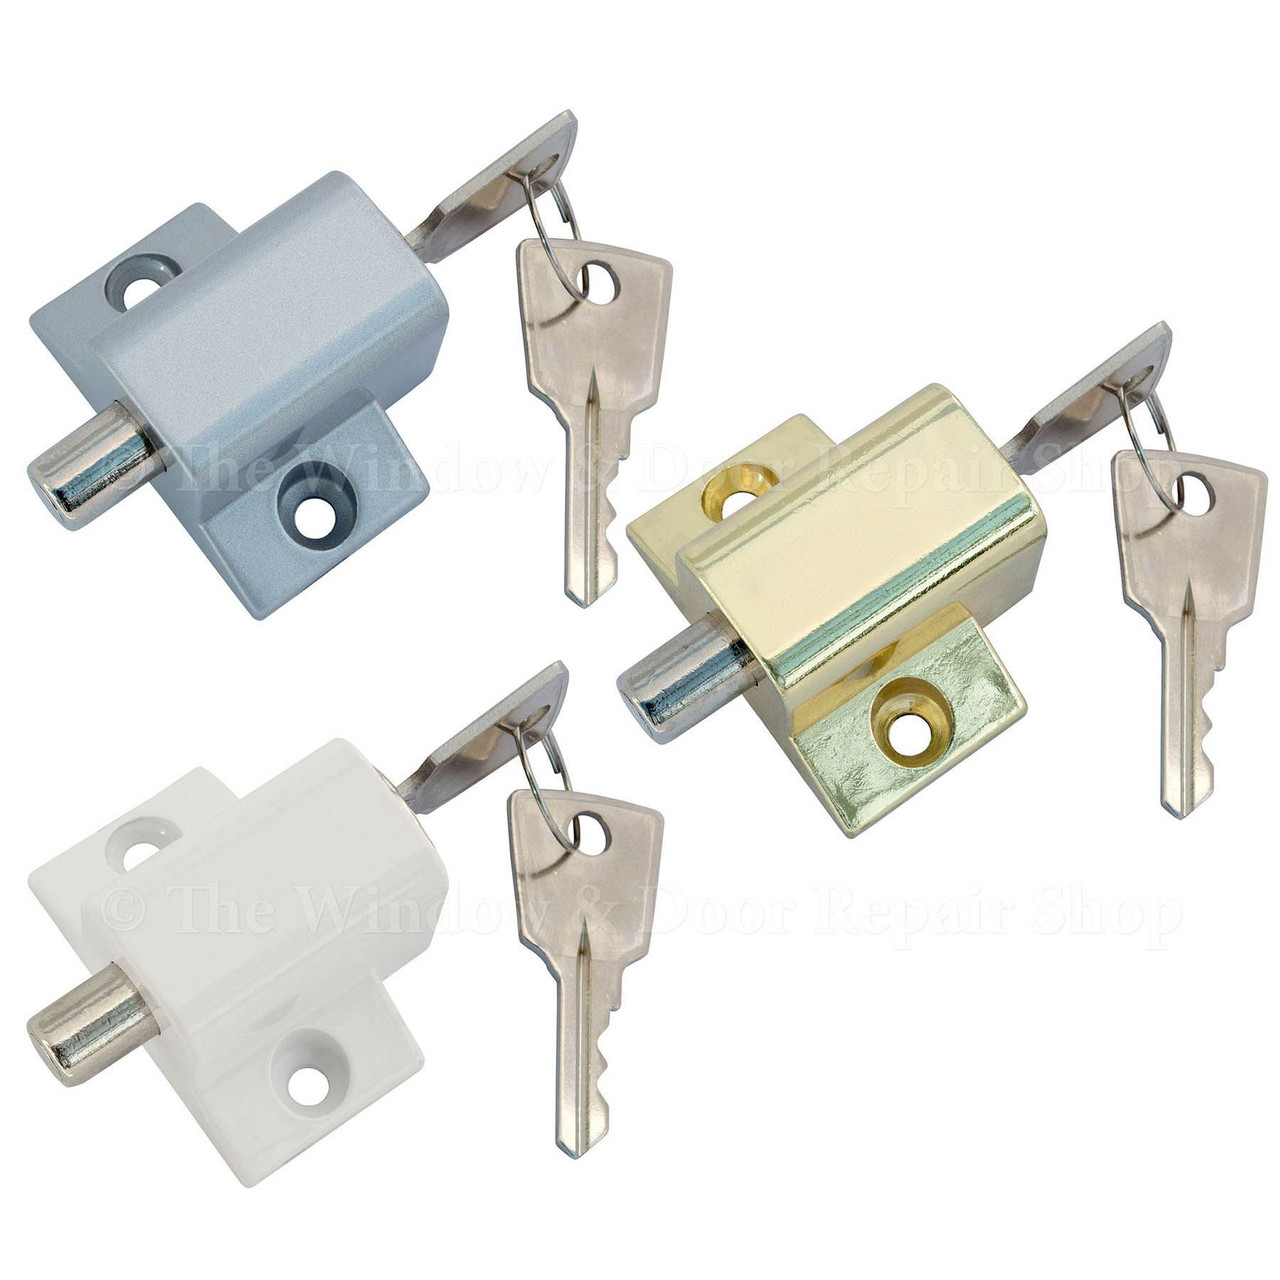 securit sliding patio door lock security dead bolt key locking